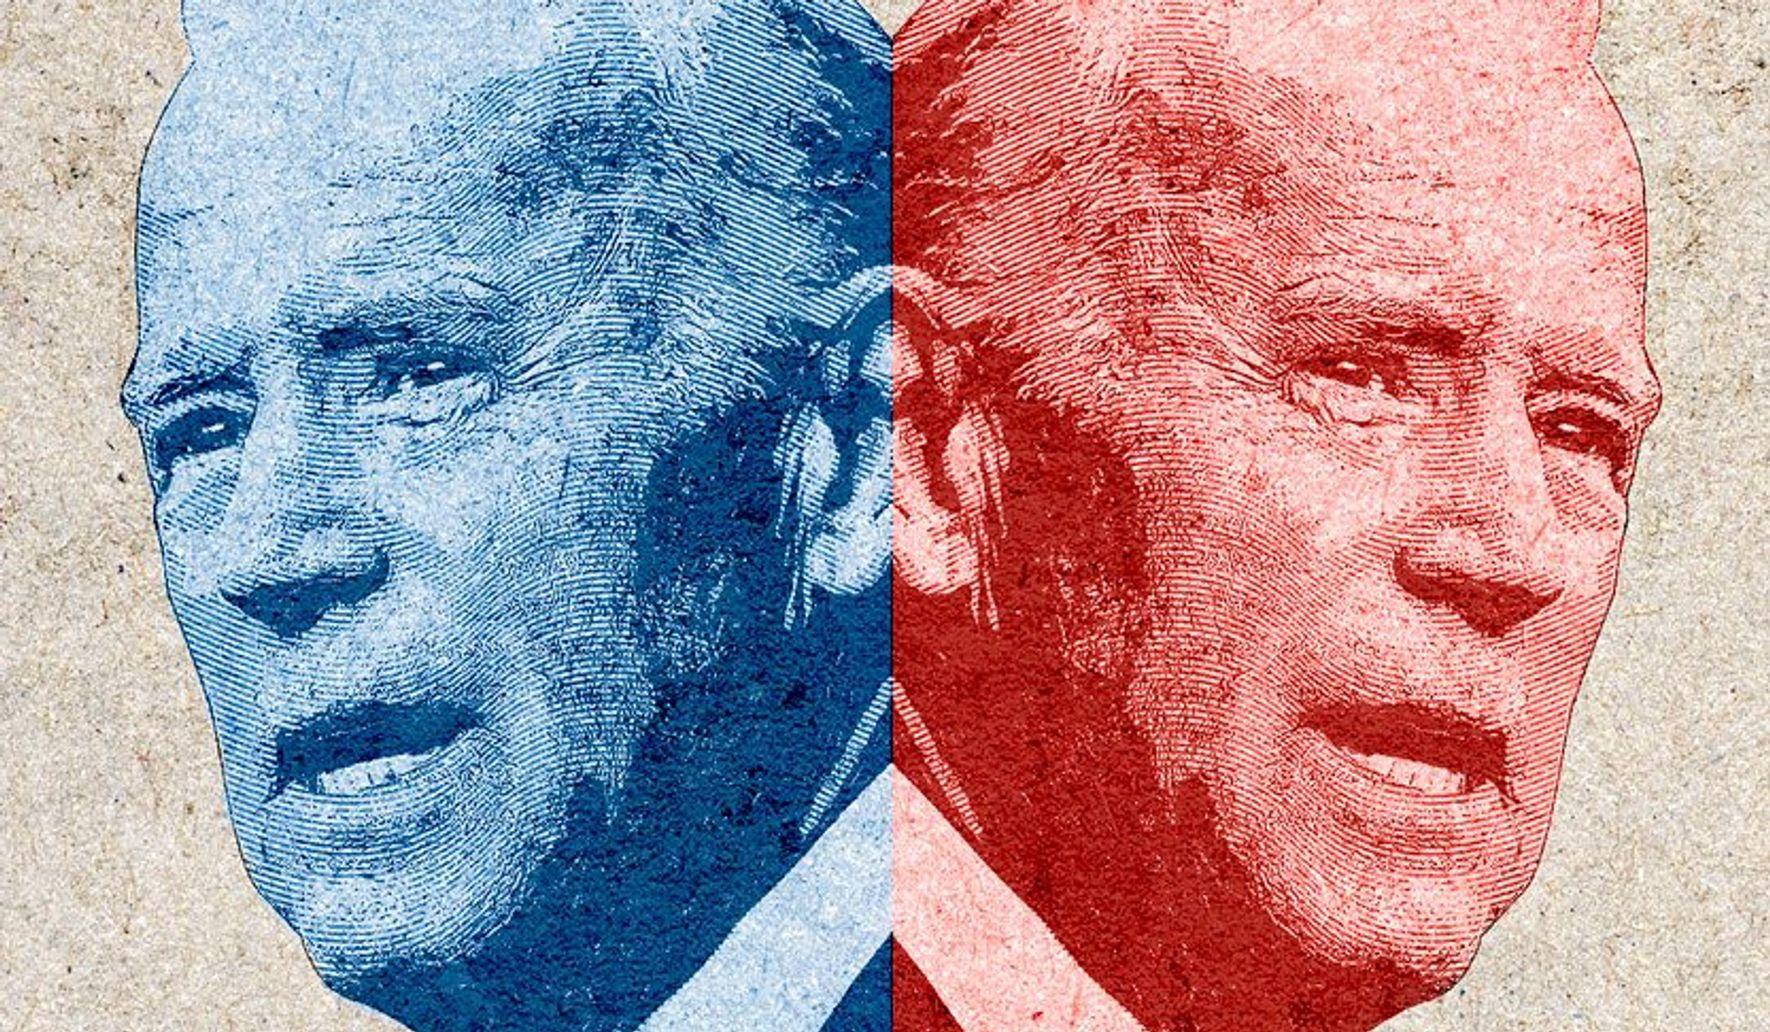 Communists approve Joe Biden for president - Washington Times